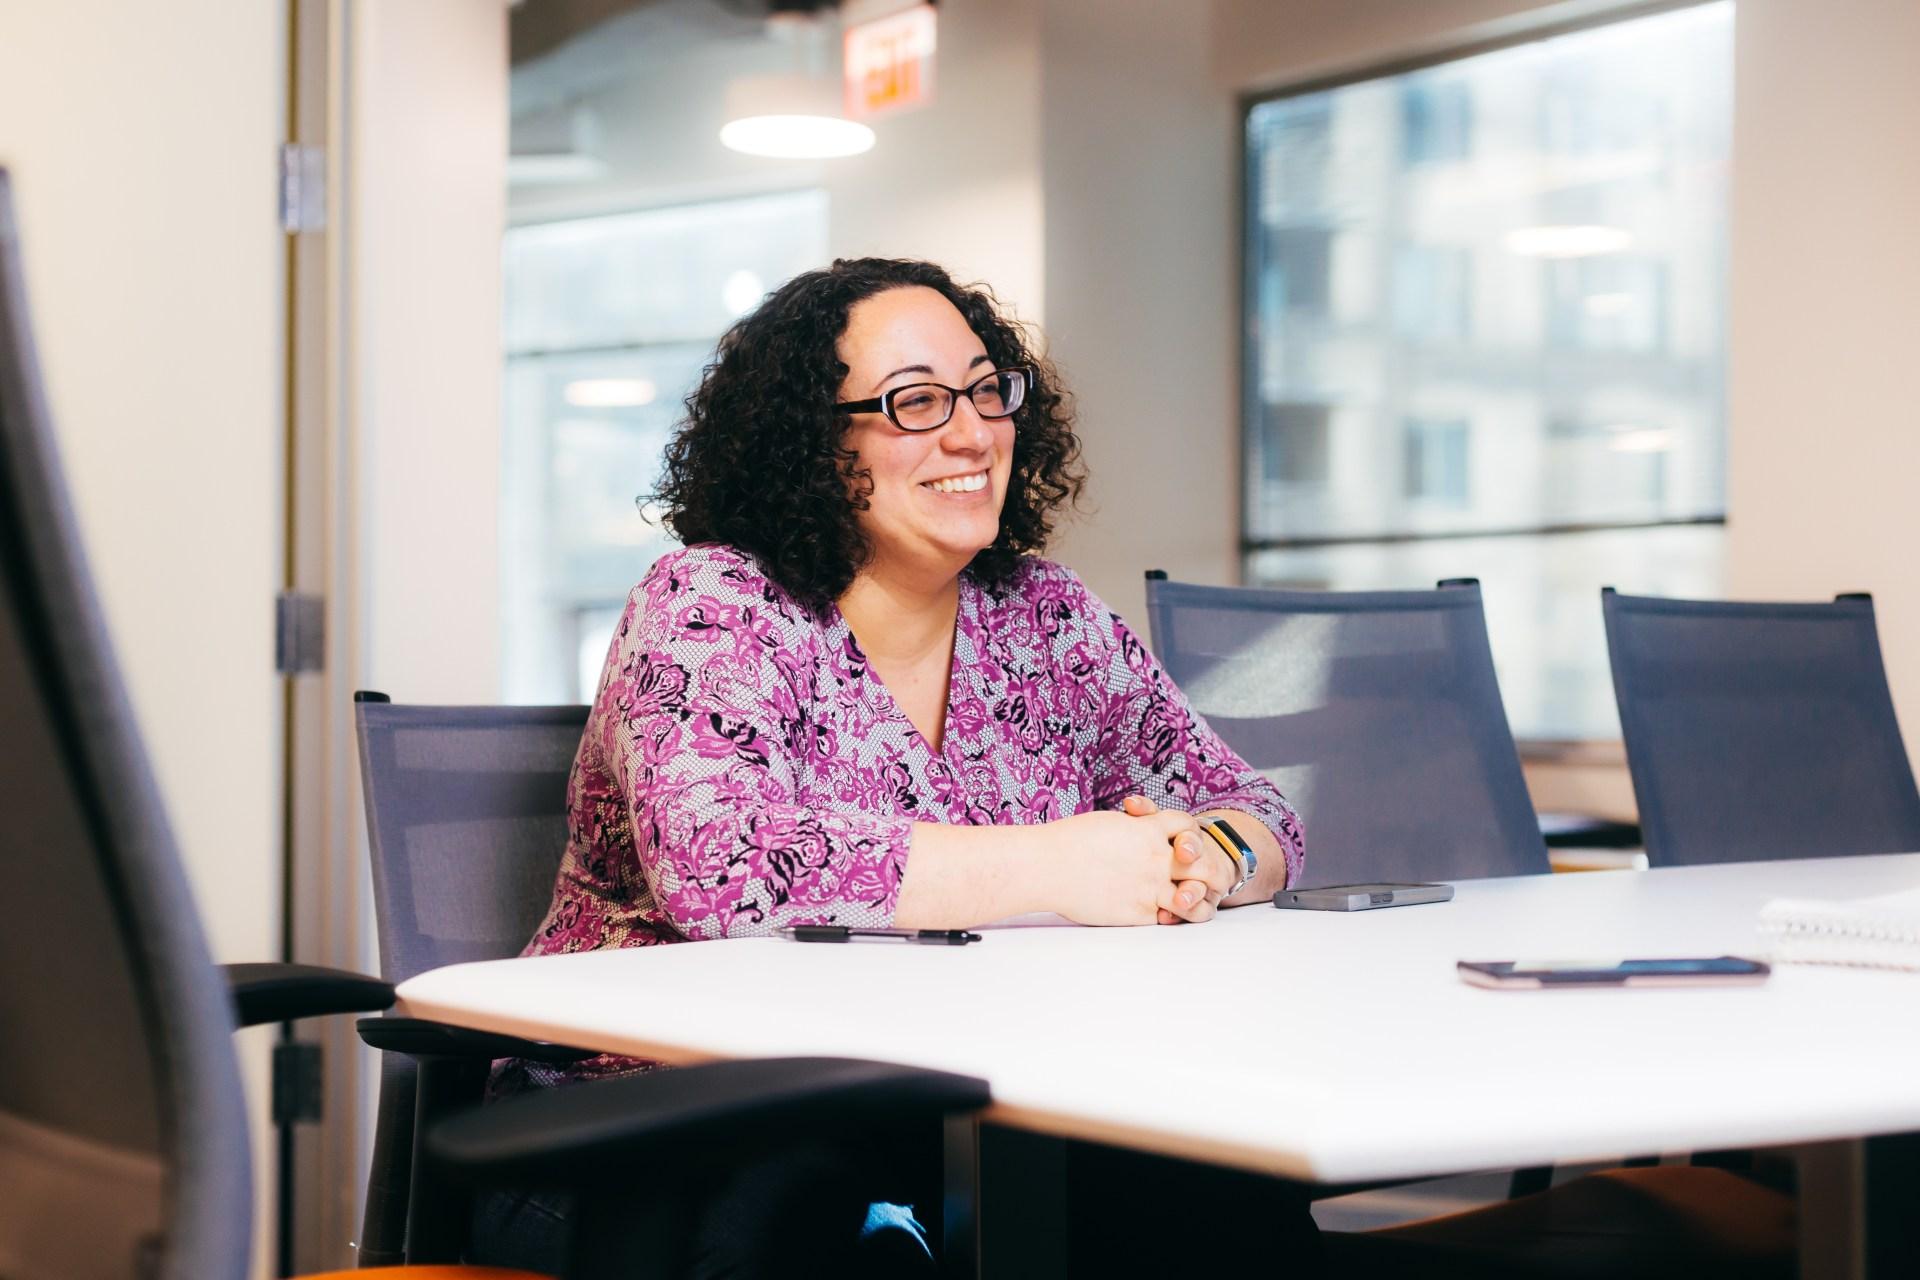 Homesnap Employee Spotlight - Leah Belin